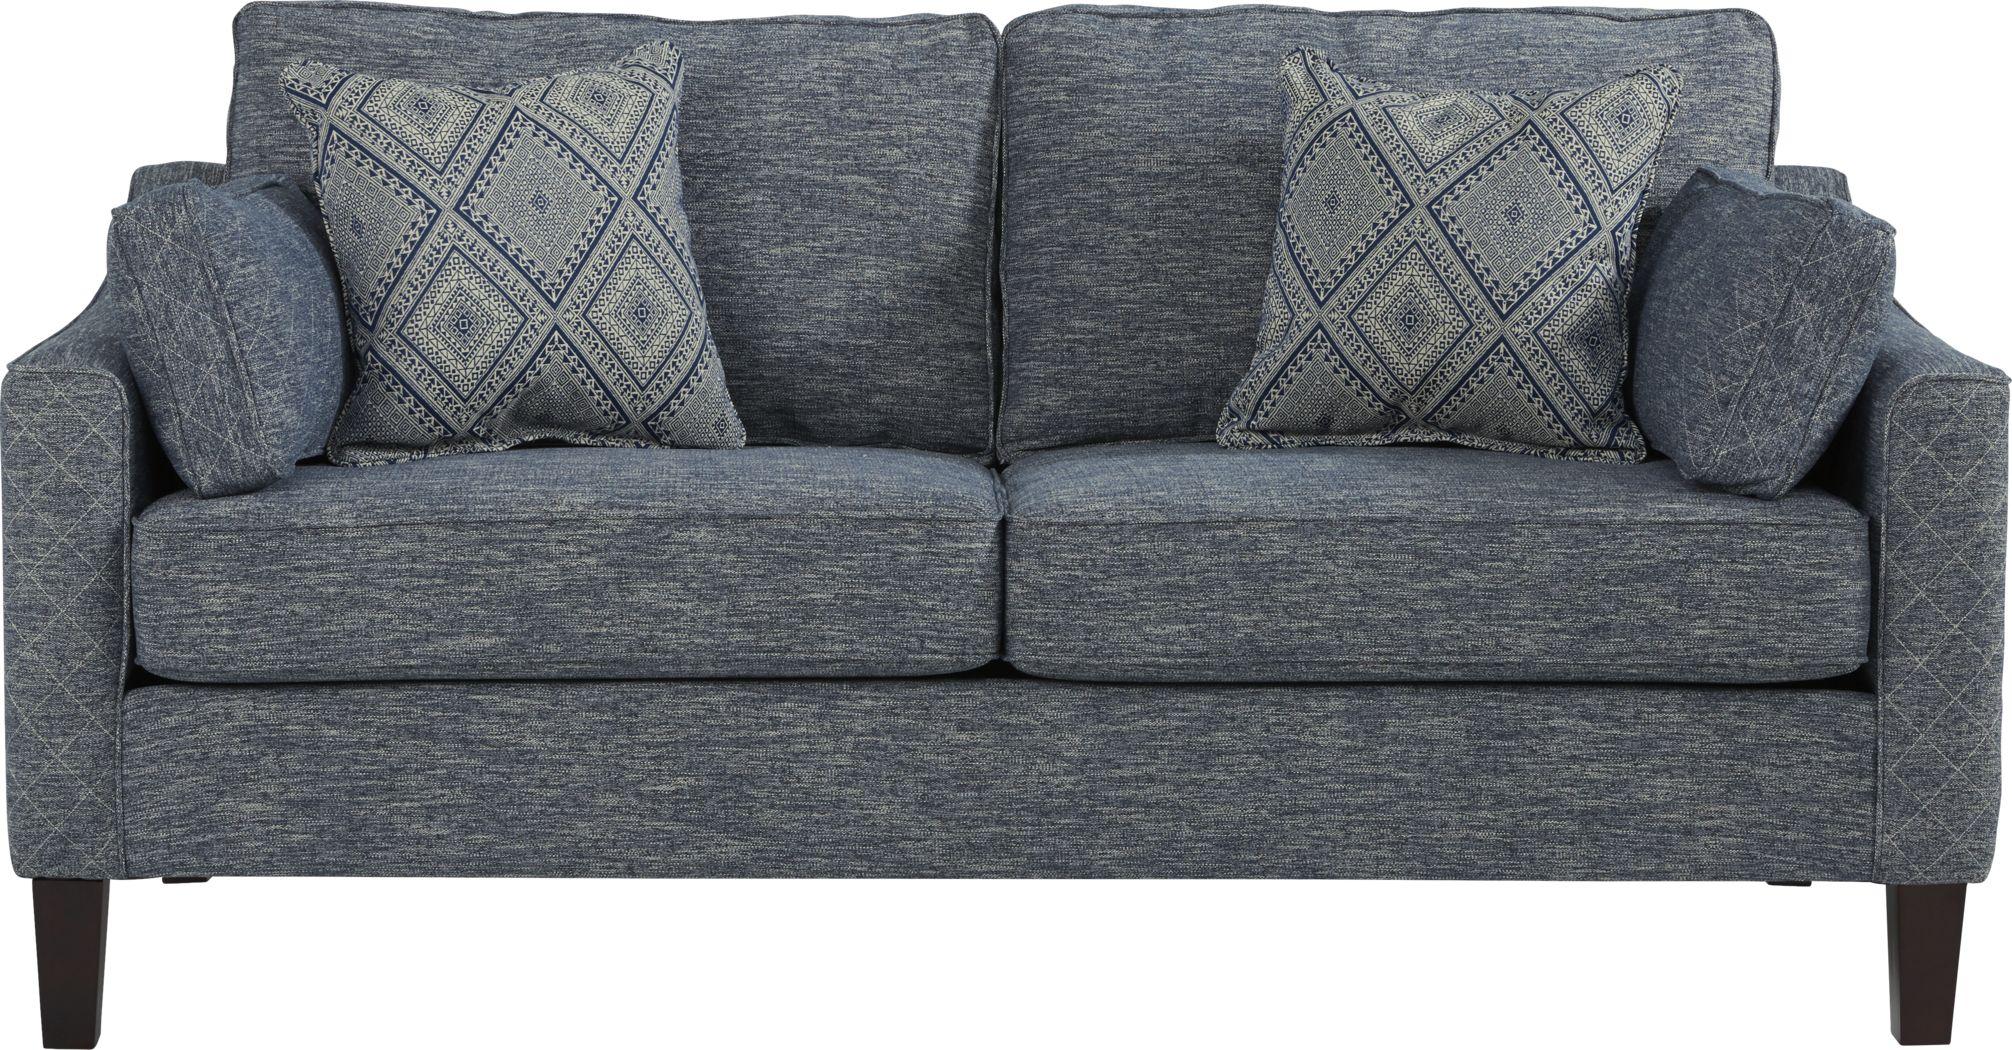 Durant Place Blue Sofa